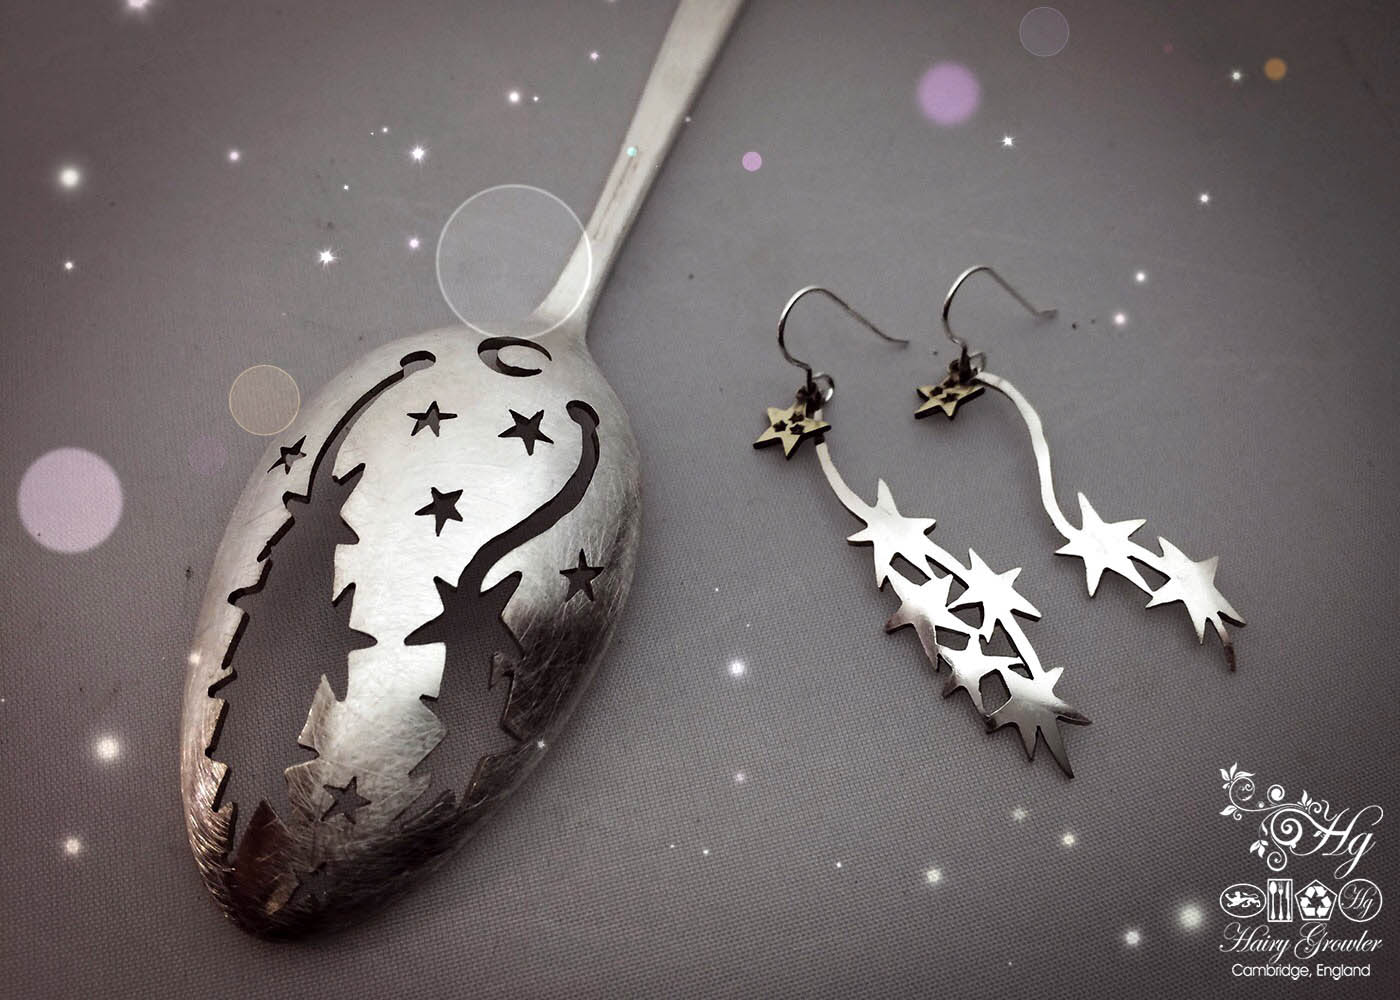 handmade and upcycled spoon star-burst earrings